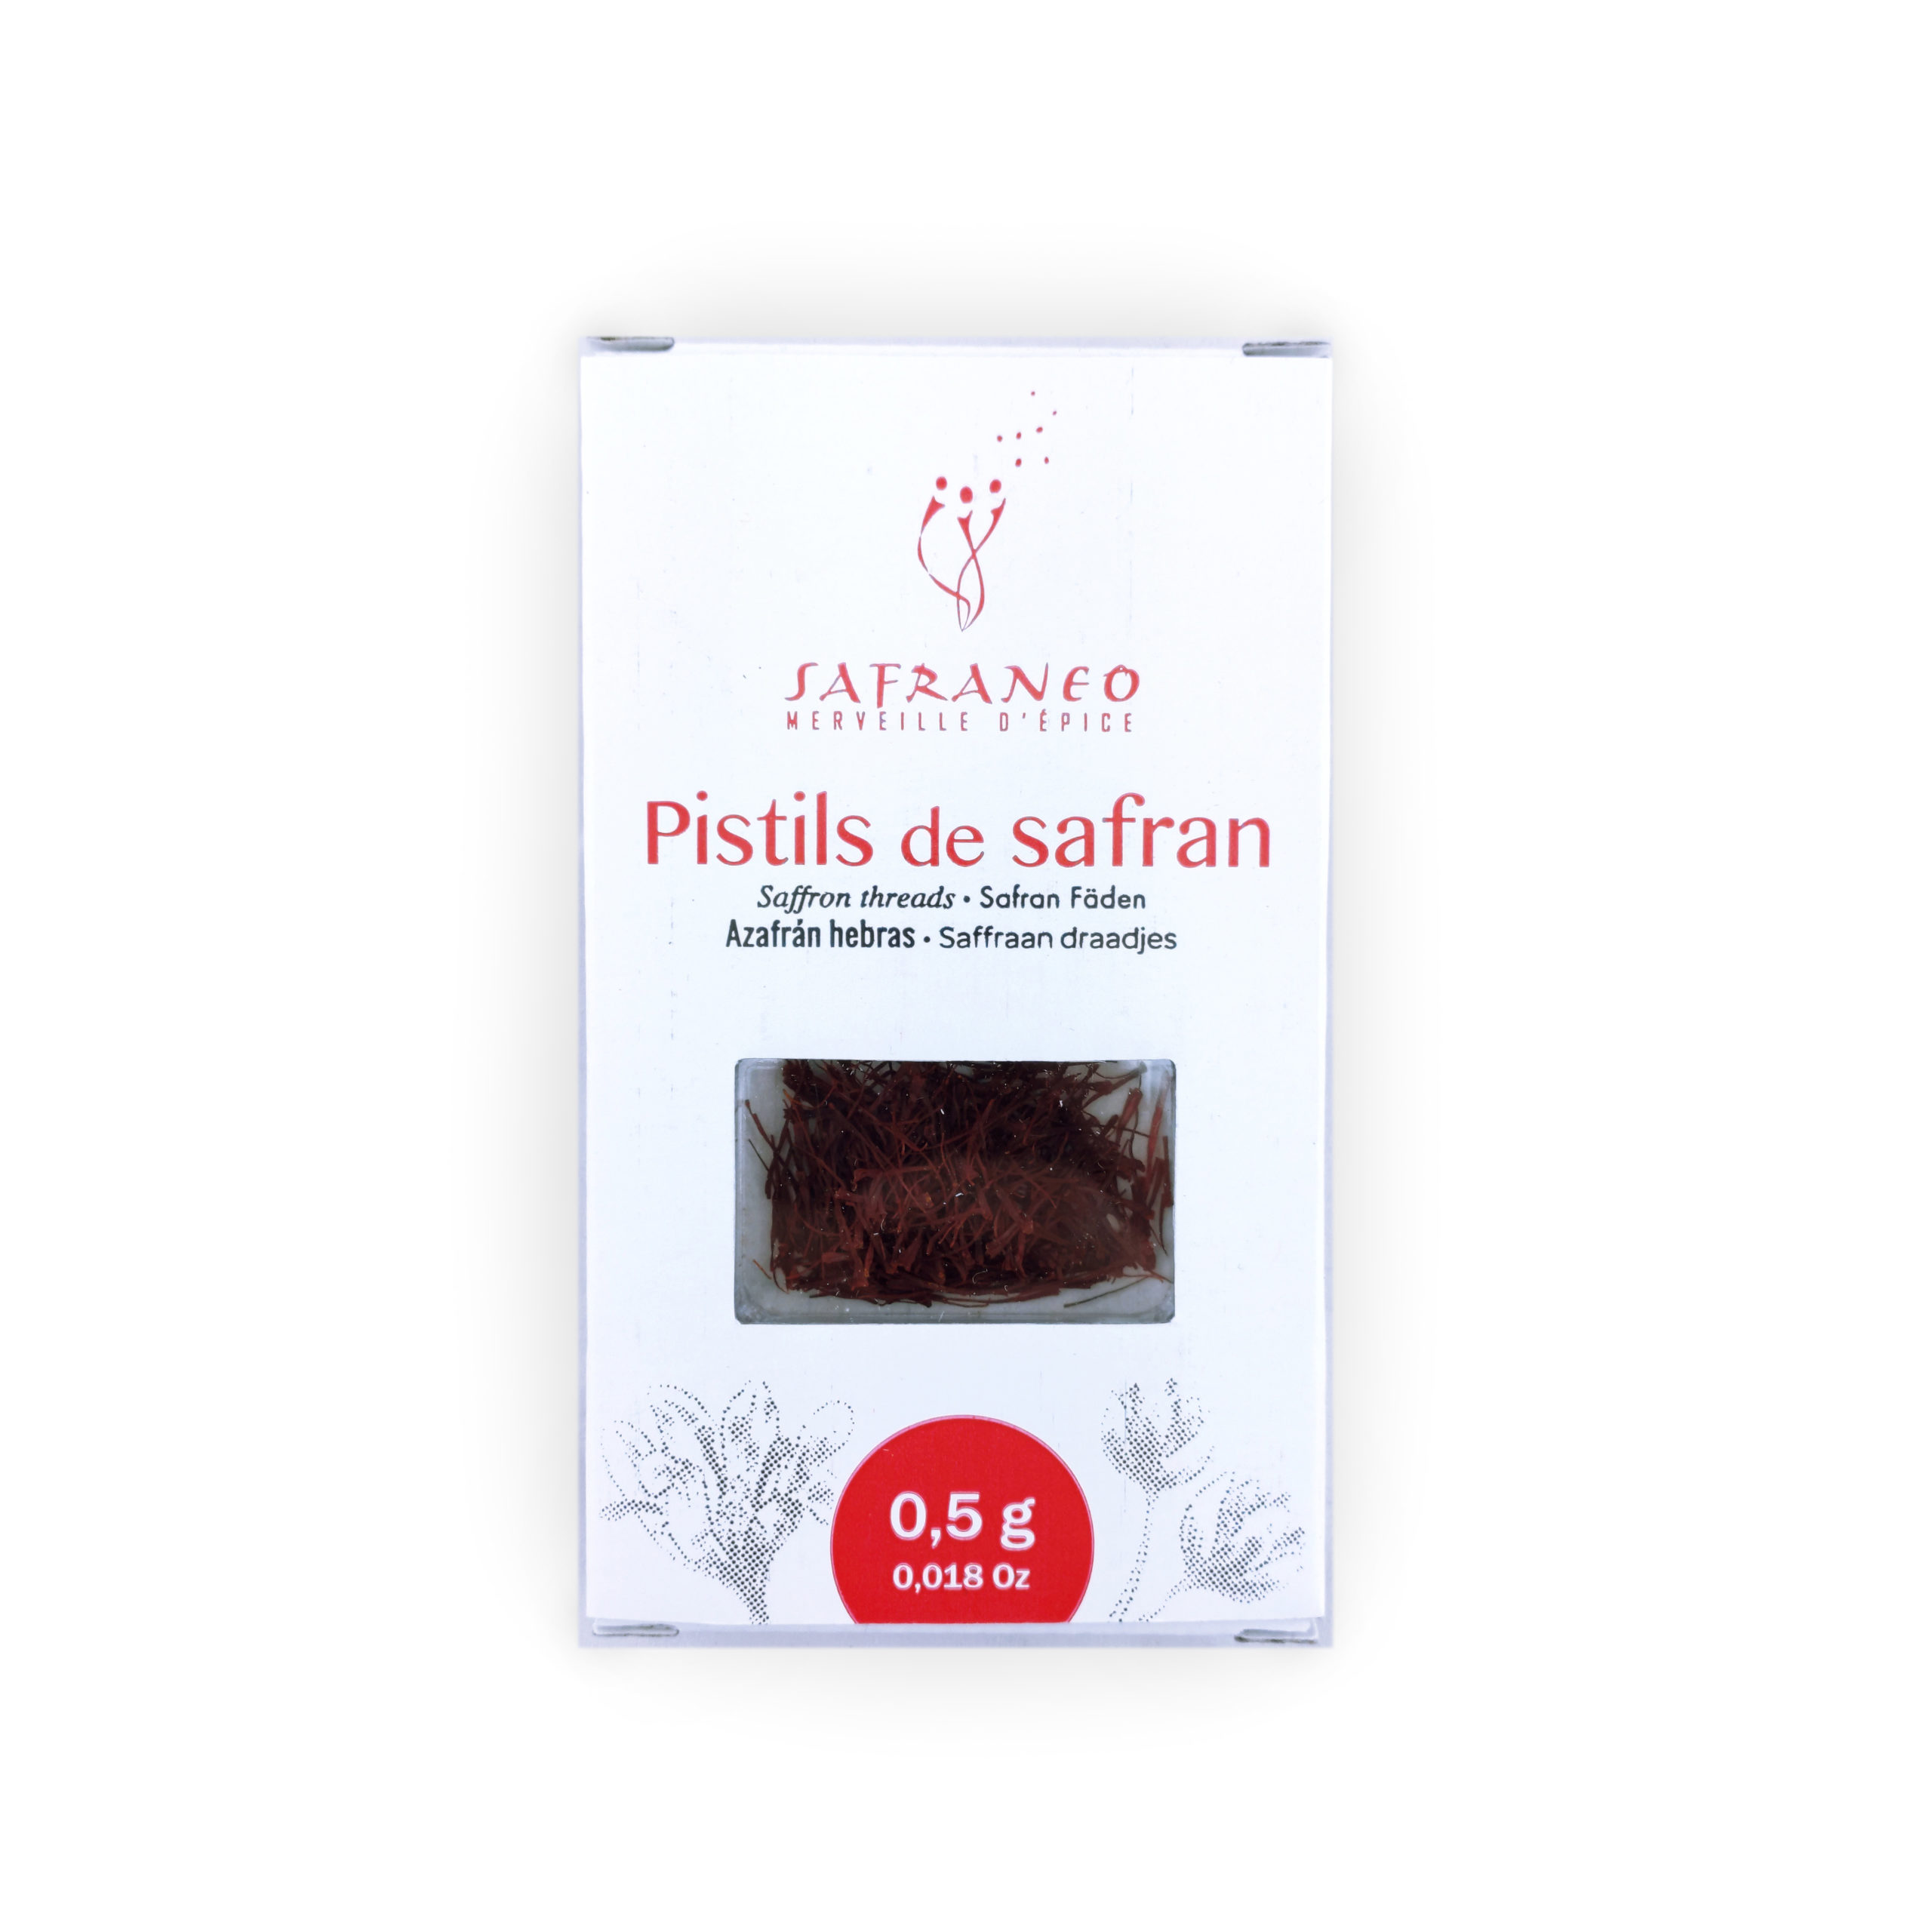 safran-pistils-de-safran-50mg-site-web-moushenco